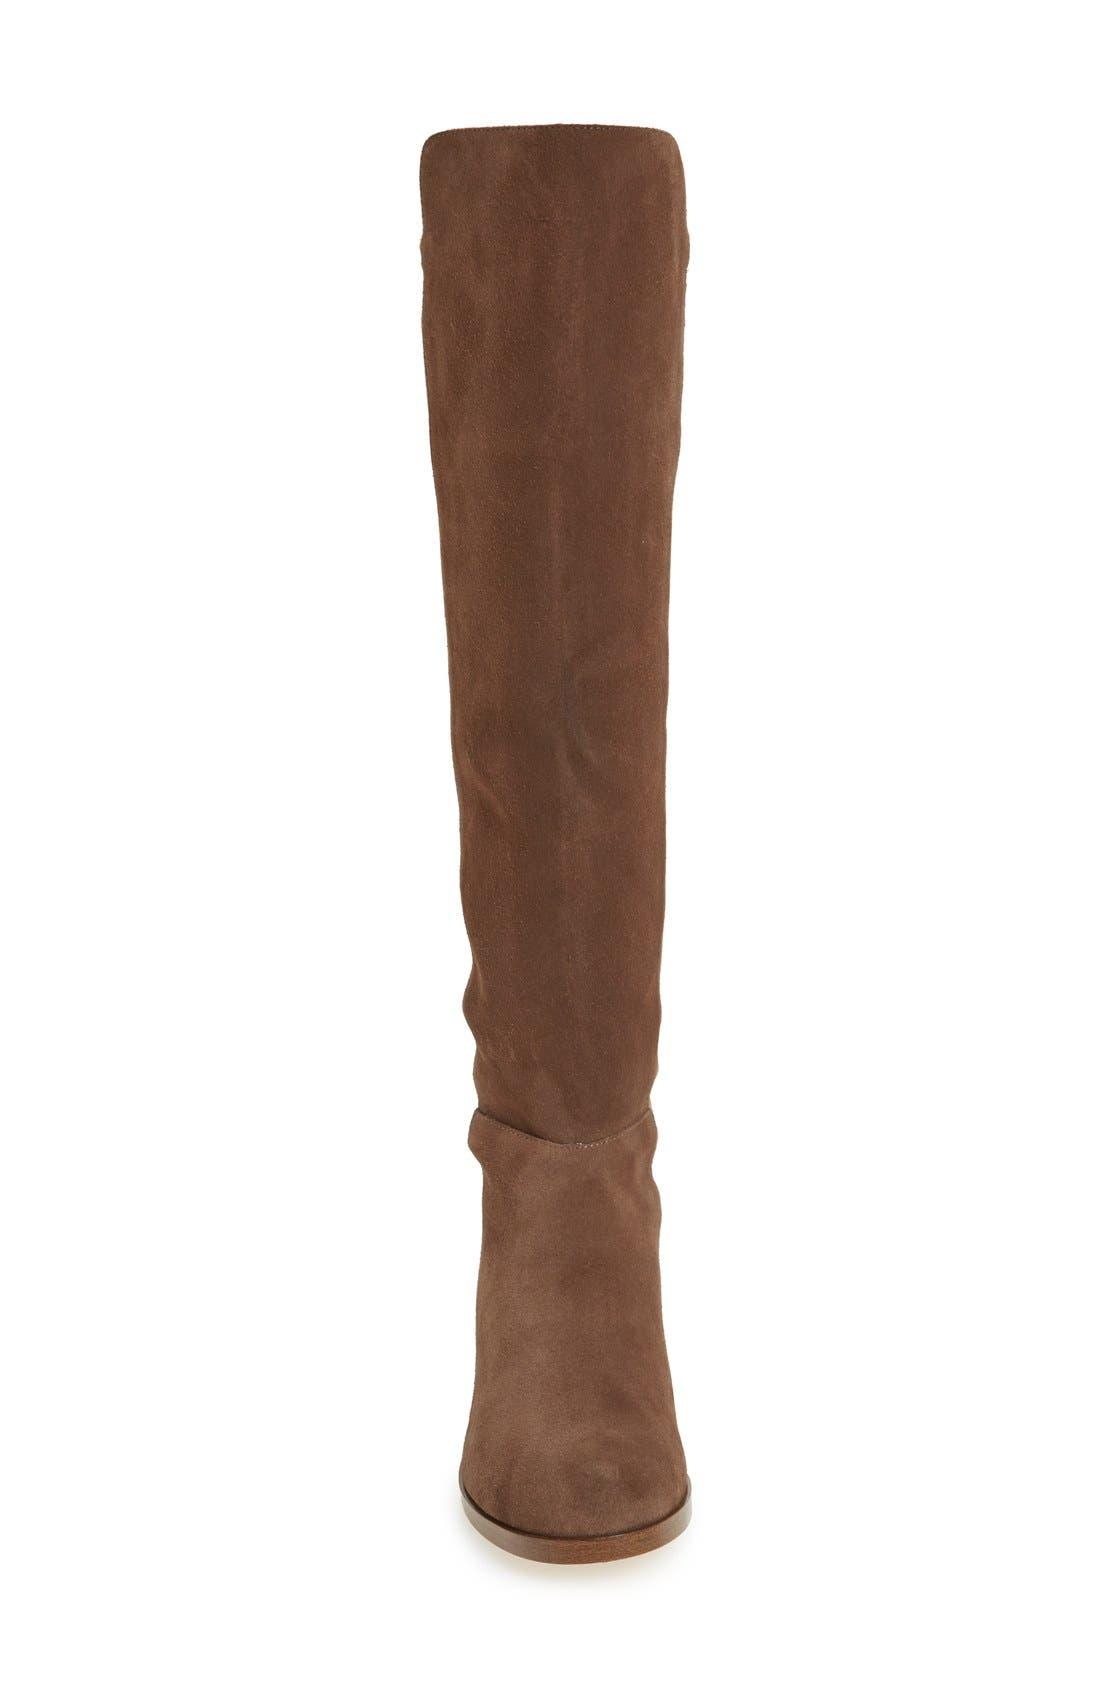 Alternate Image 3  - Sole Society Calypso Over the Knee Boot (Women)